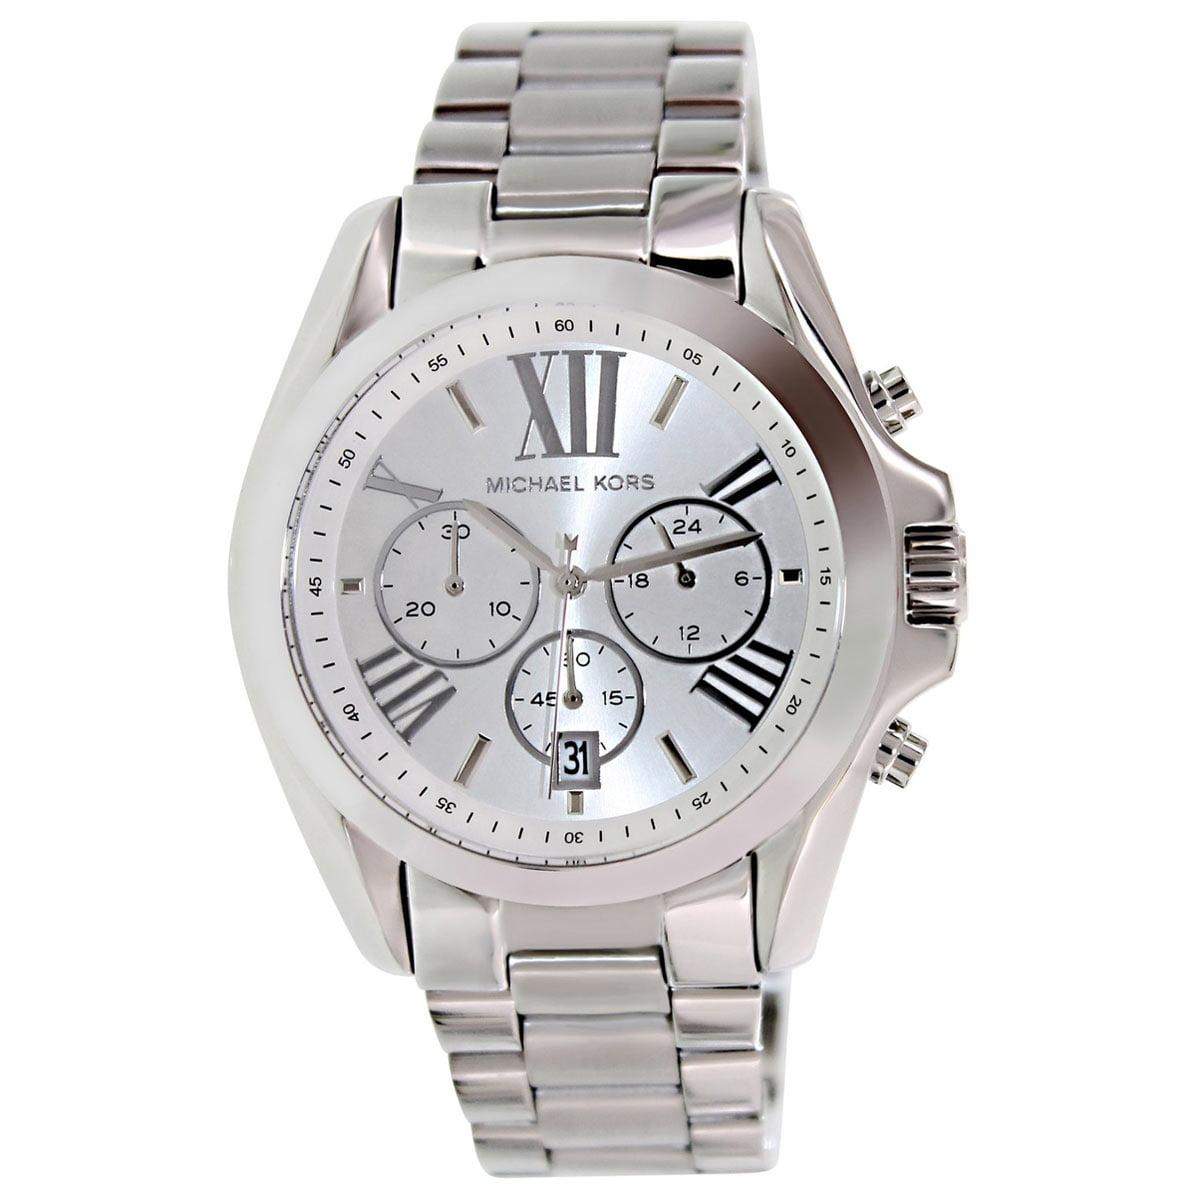 Michael Kors MK5535 Women's Bradshaw Silver Tone Dial Stainless Steel Bracelet Chronograph Watch